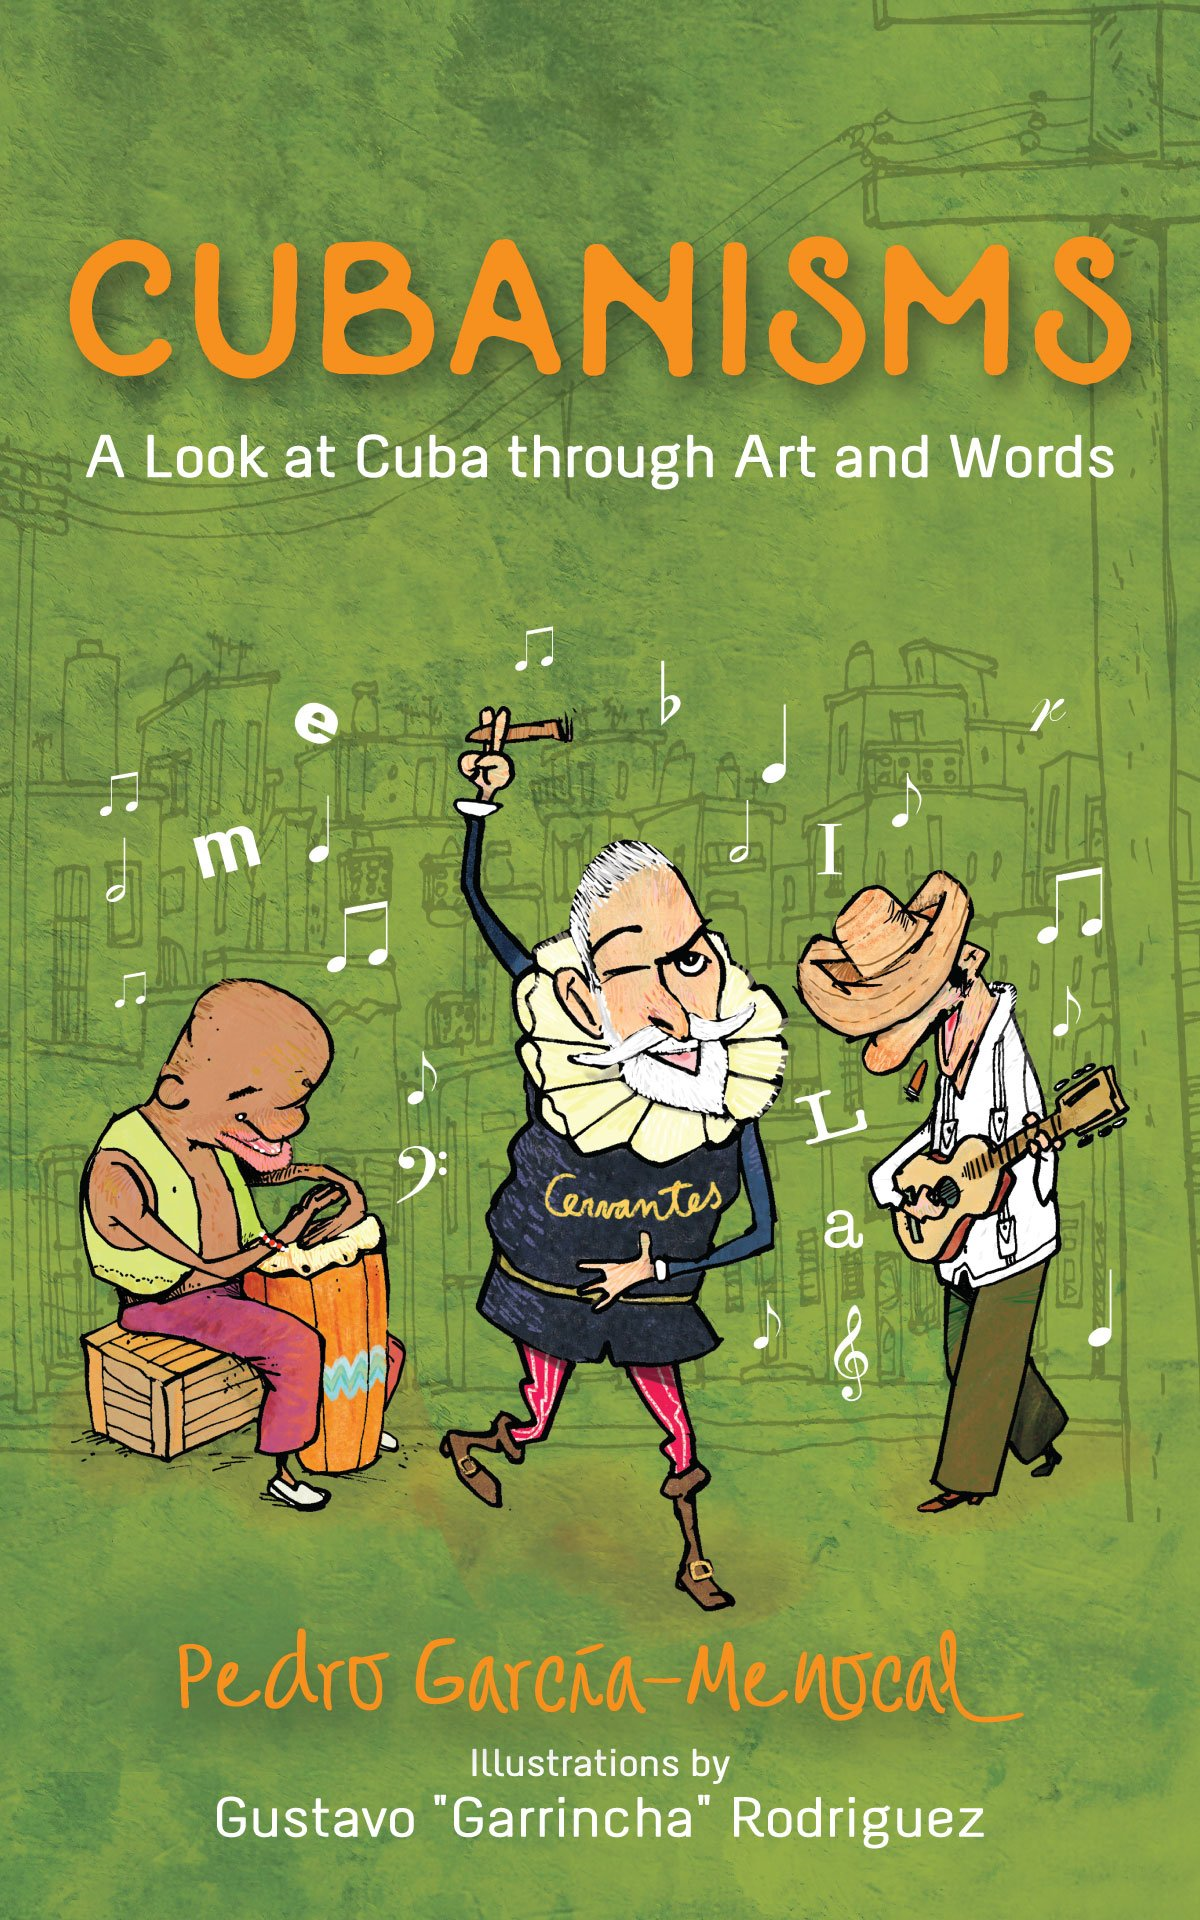 Cubanisms: A Look at Cuba through Art and Words PDF